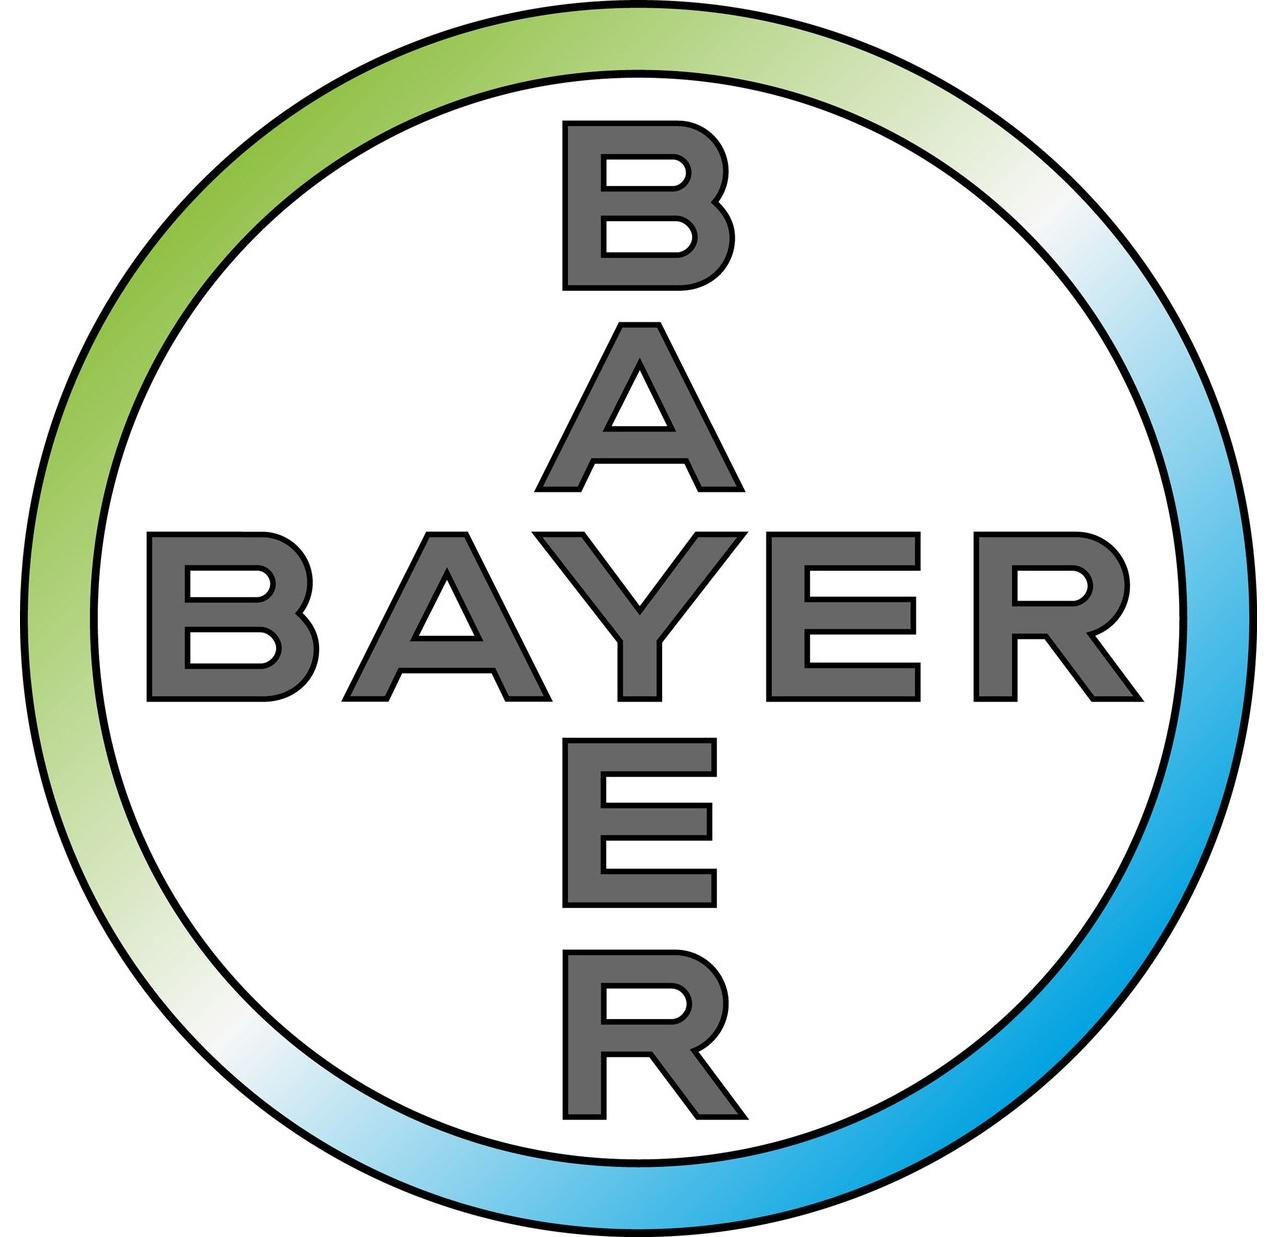 Bayer_Corporation_LOGO.jpg